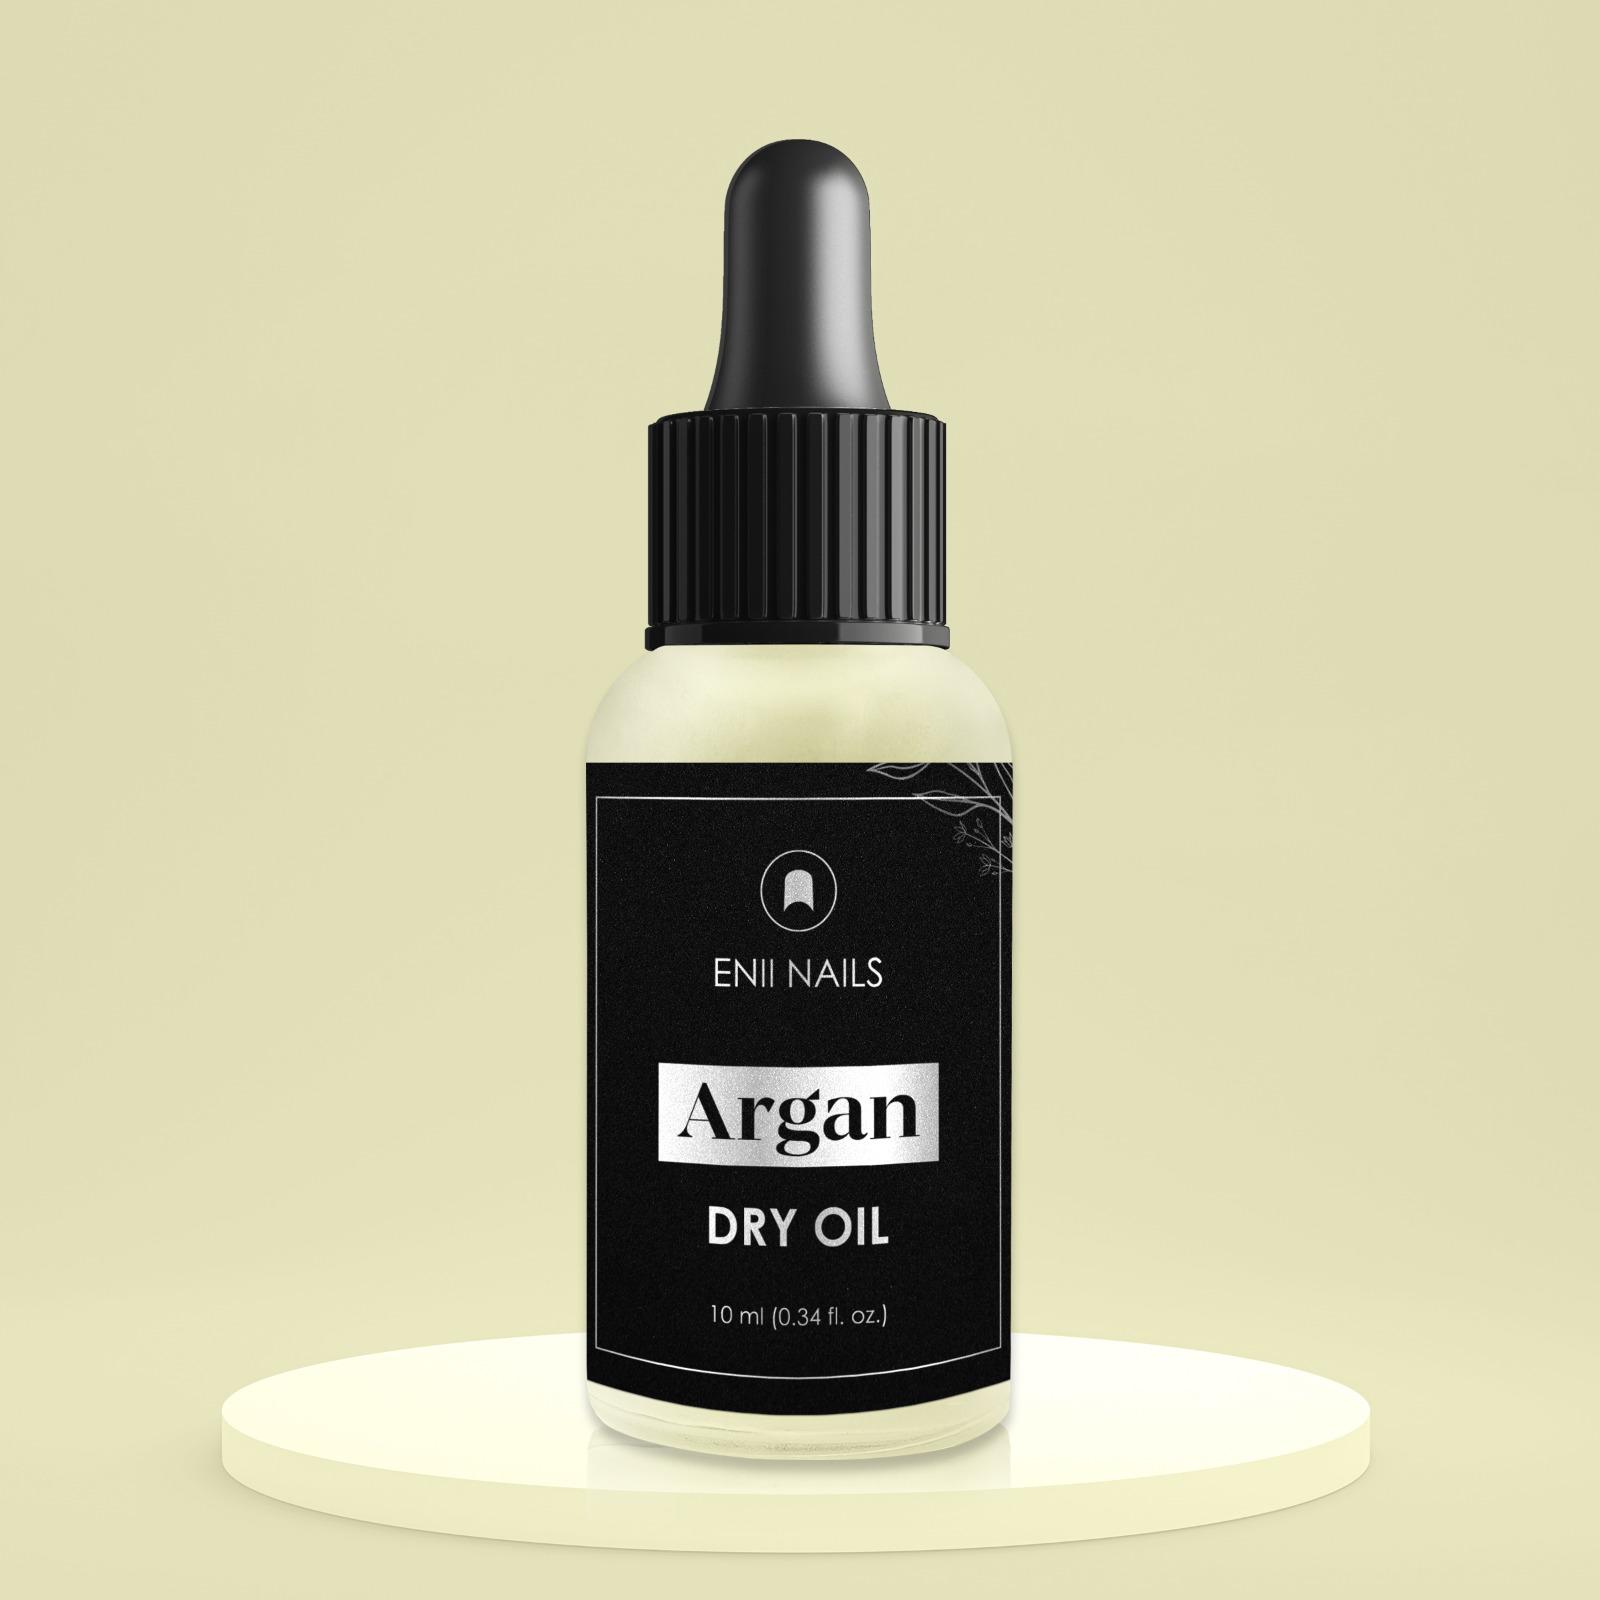 MULTI-FUNCTIONAL ARGAN DRY OIL- fruity